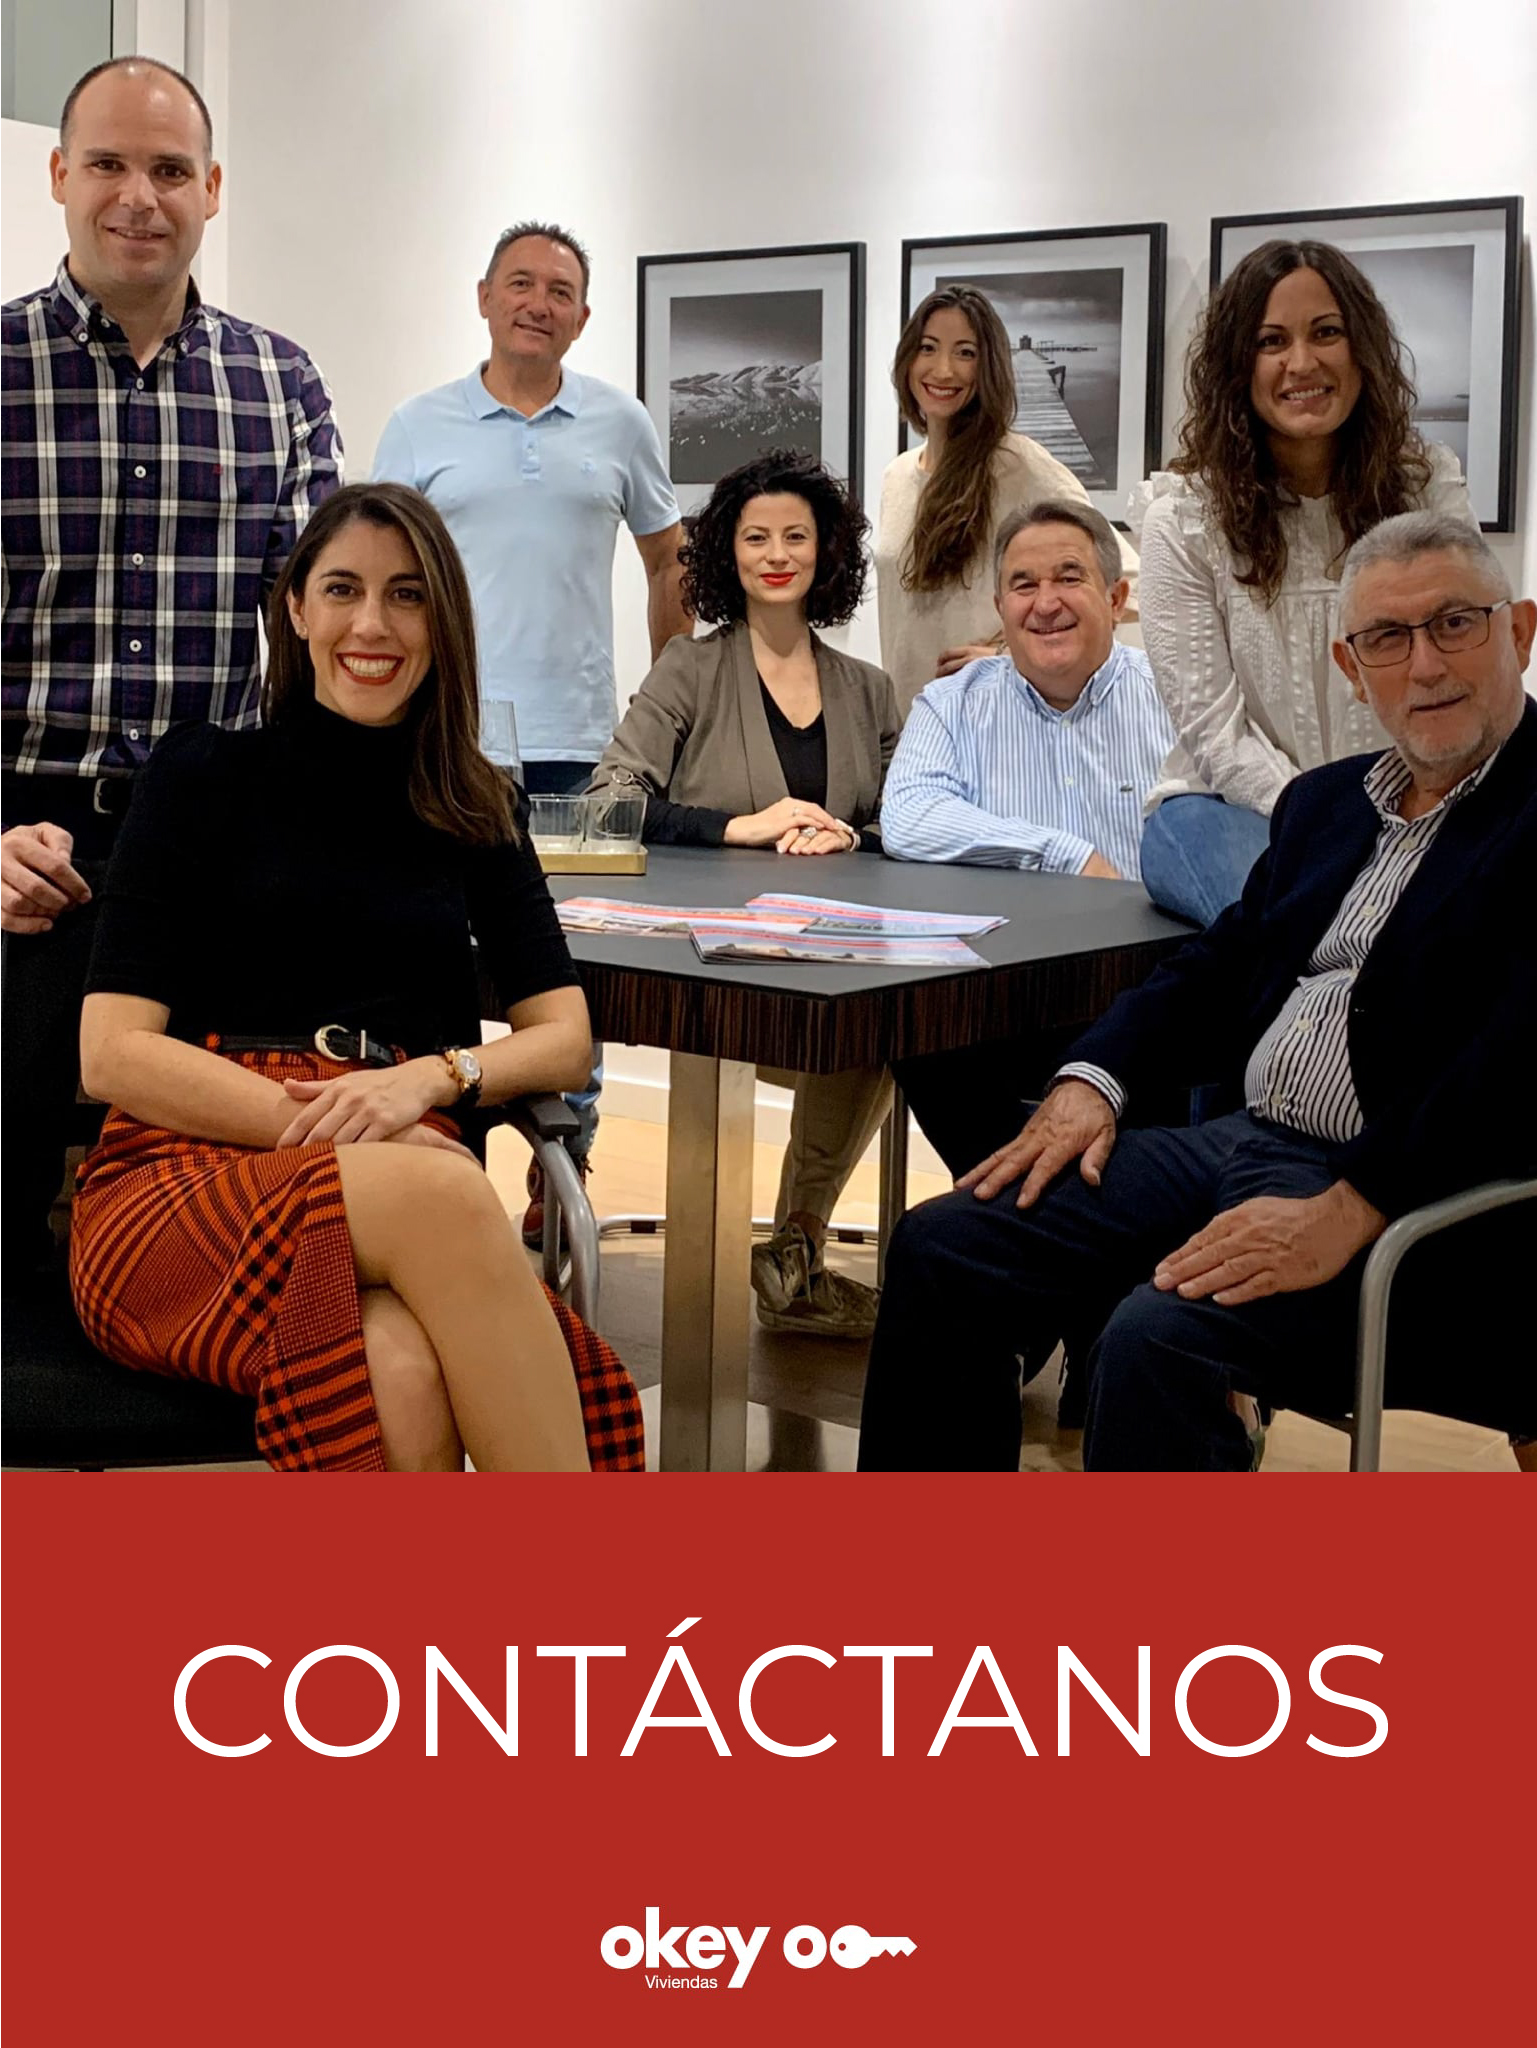 https://okeyviviendas.com/wp-content/uploads/2020/11/CONTACTO-OKEY-VIVIENDAS-02.jpg